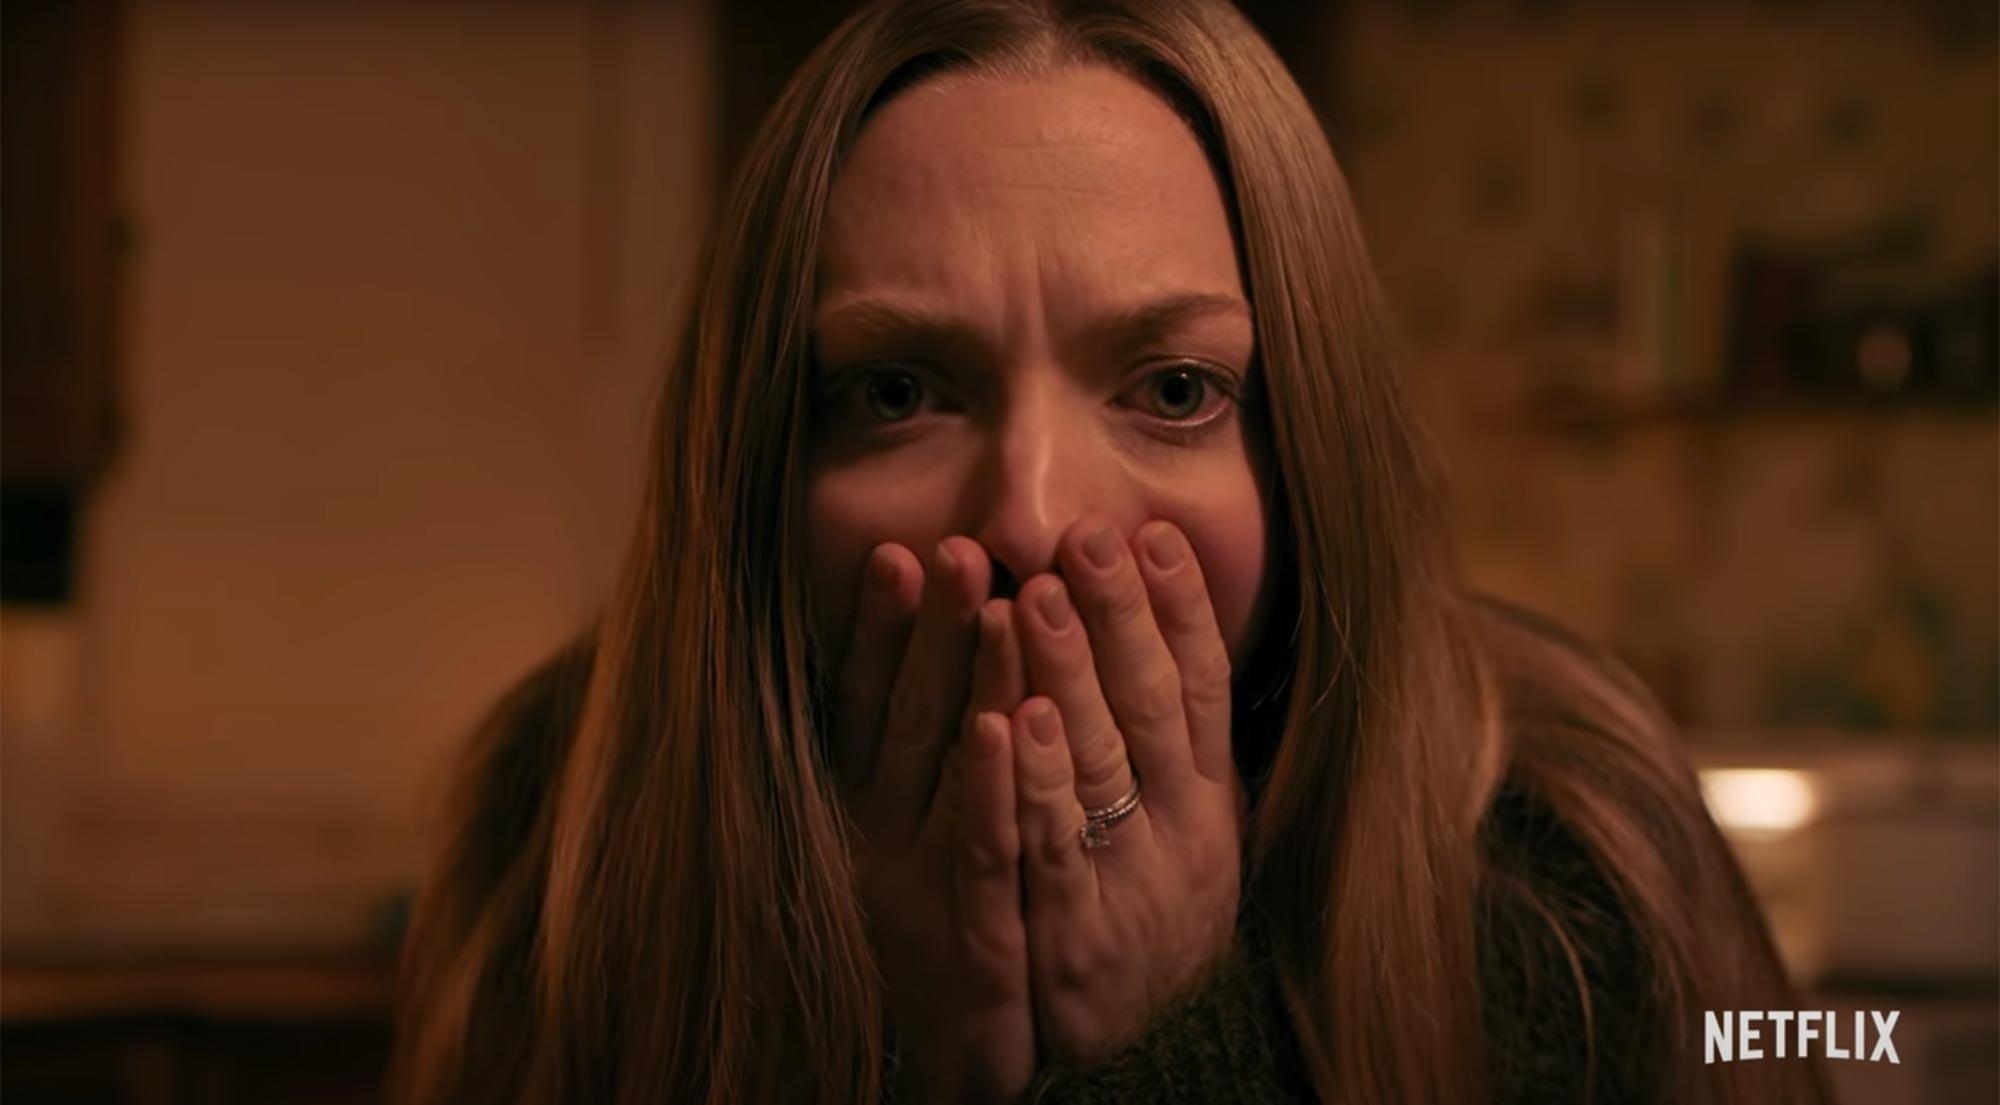 Watch Things Heard and Seen trailer with Amanda Seyfried and James Norton | EW.com